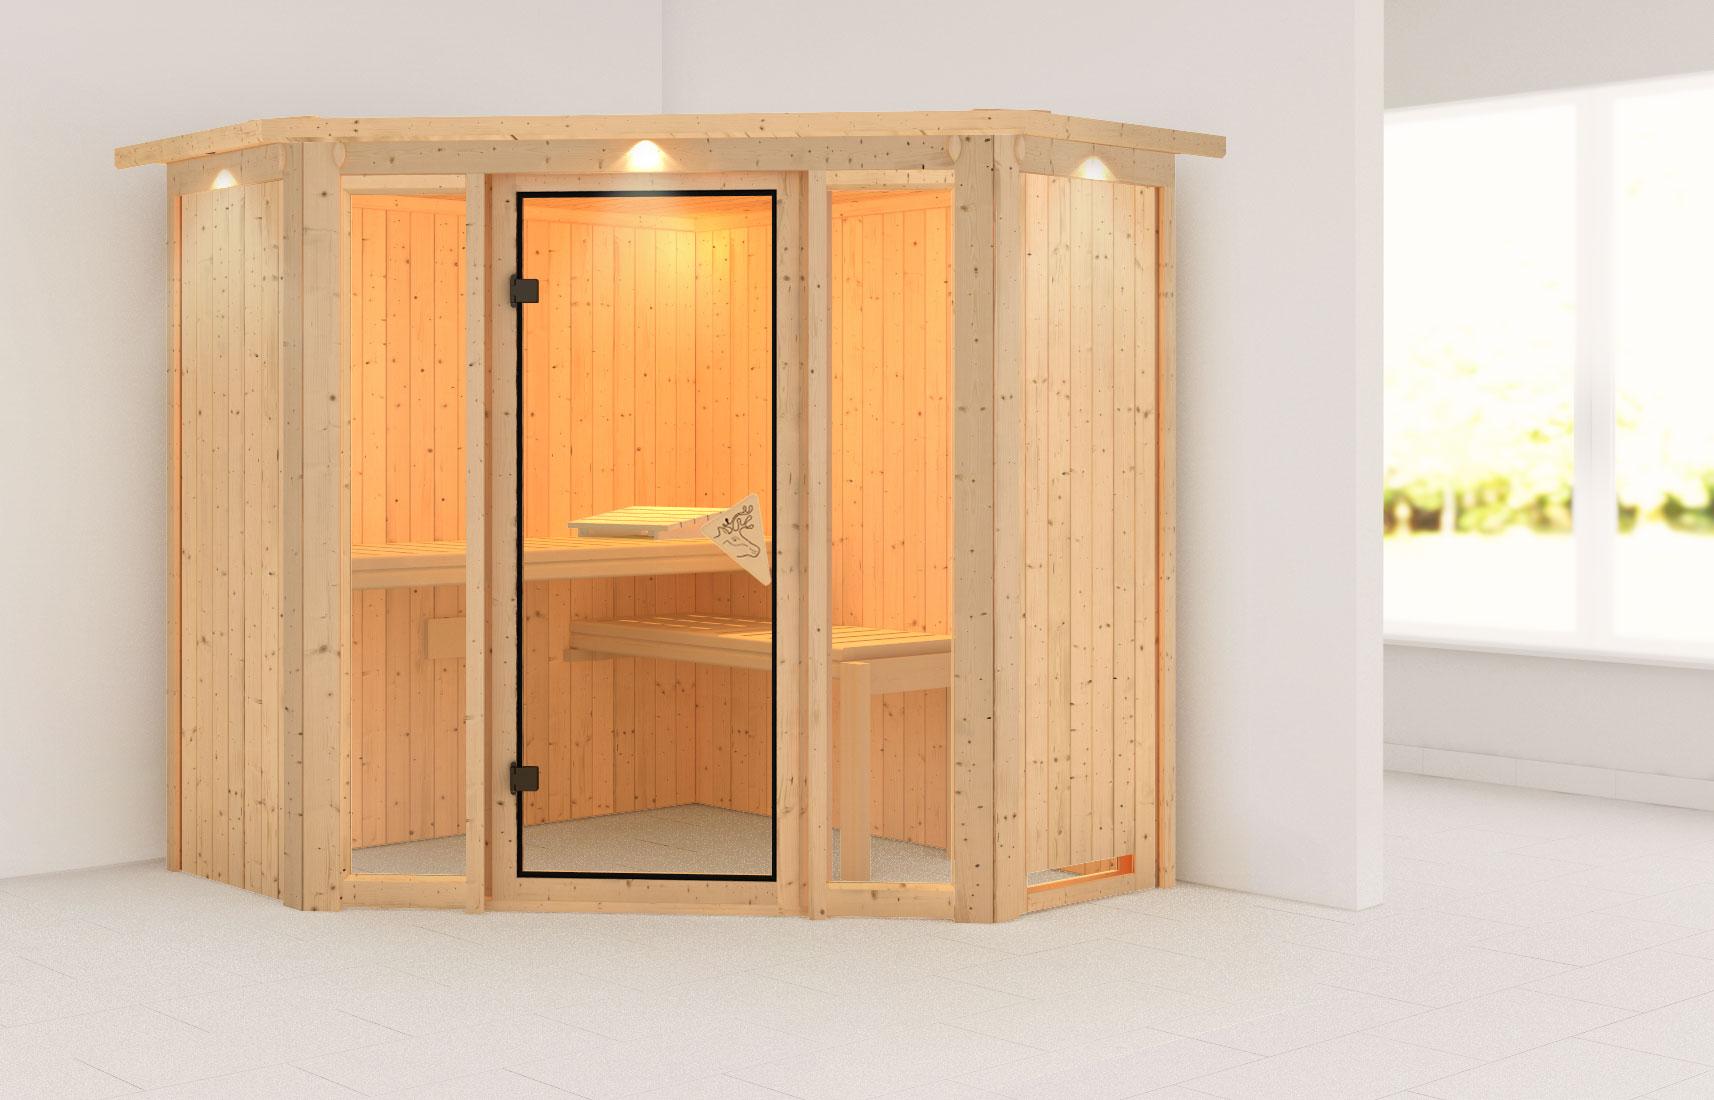 Karibu Sauna Flora 1 68mm Dachkranz ohne Ofen classic Tür Bild 1